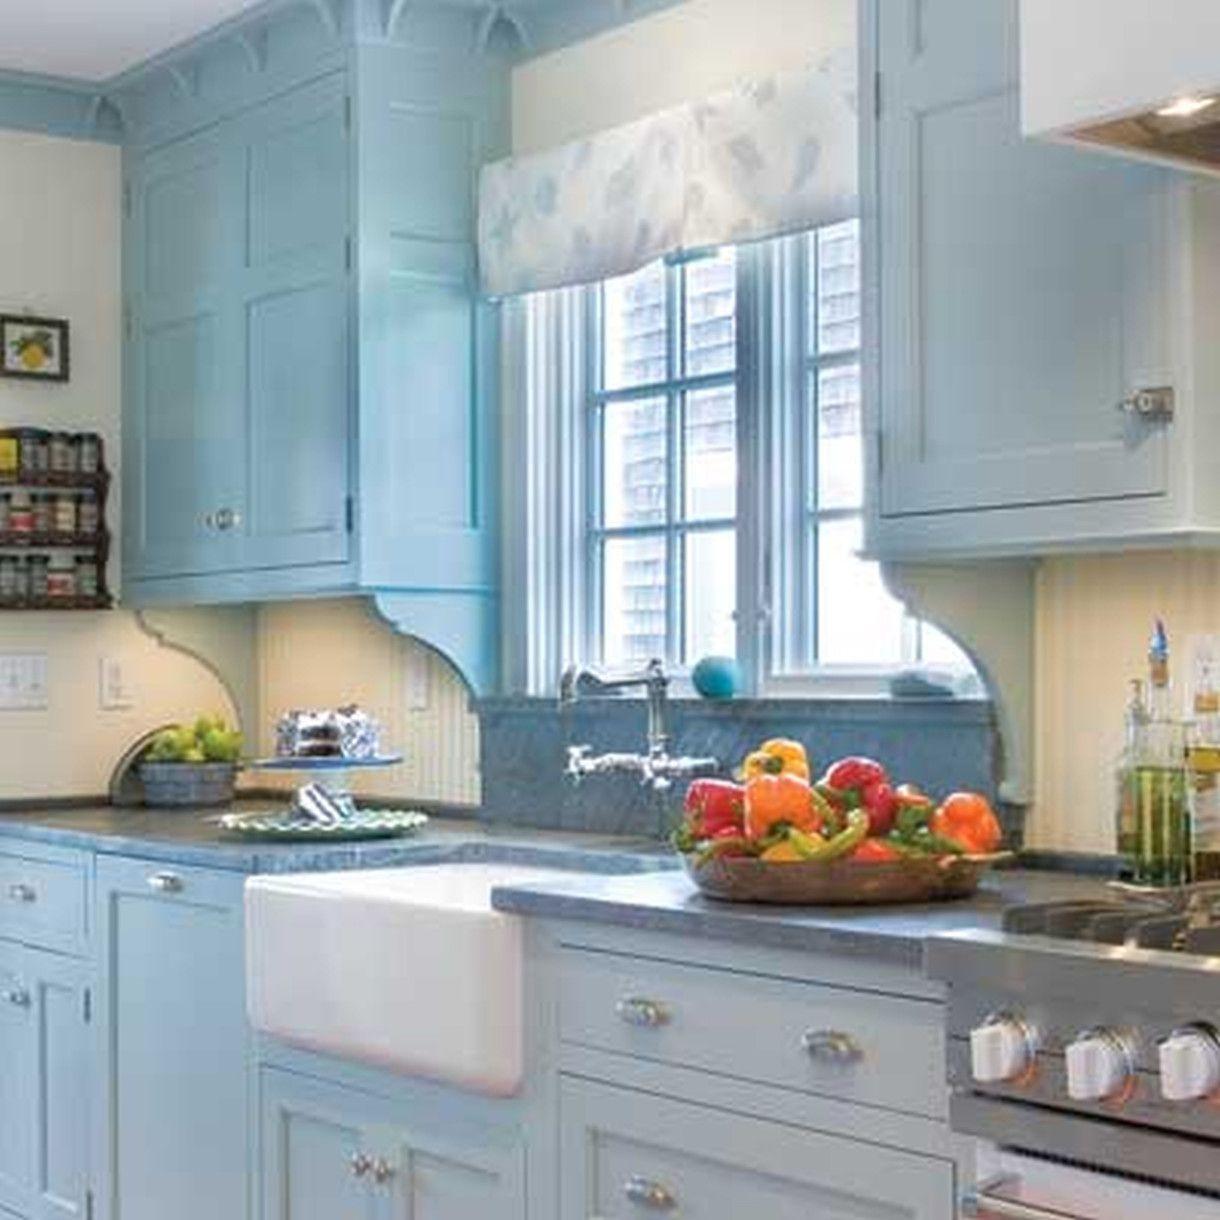 light blue kitcken cabinets google search with images kitchen decor kmart kitchen island on kitchen decor blue id=89204